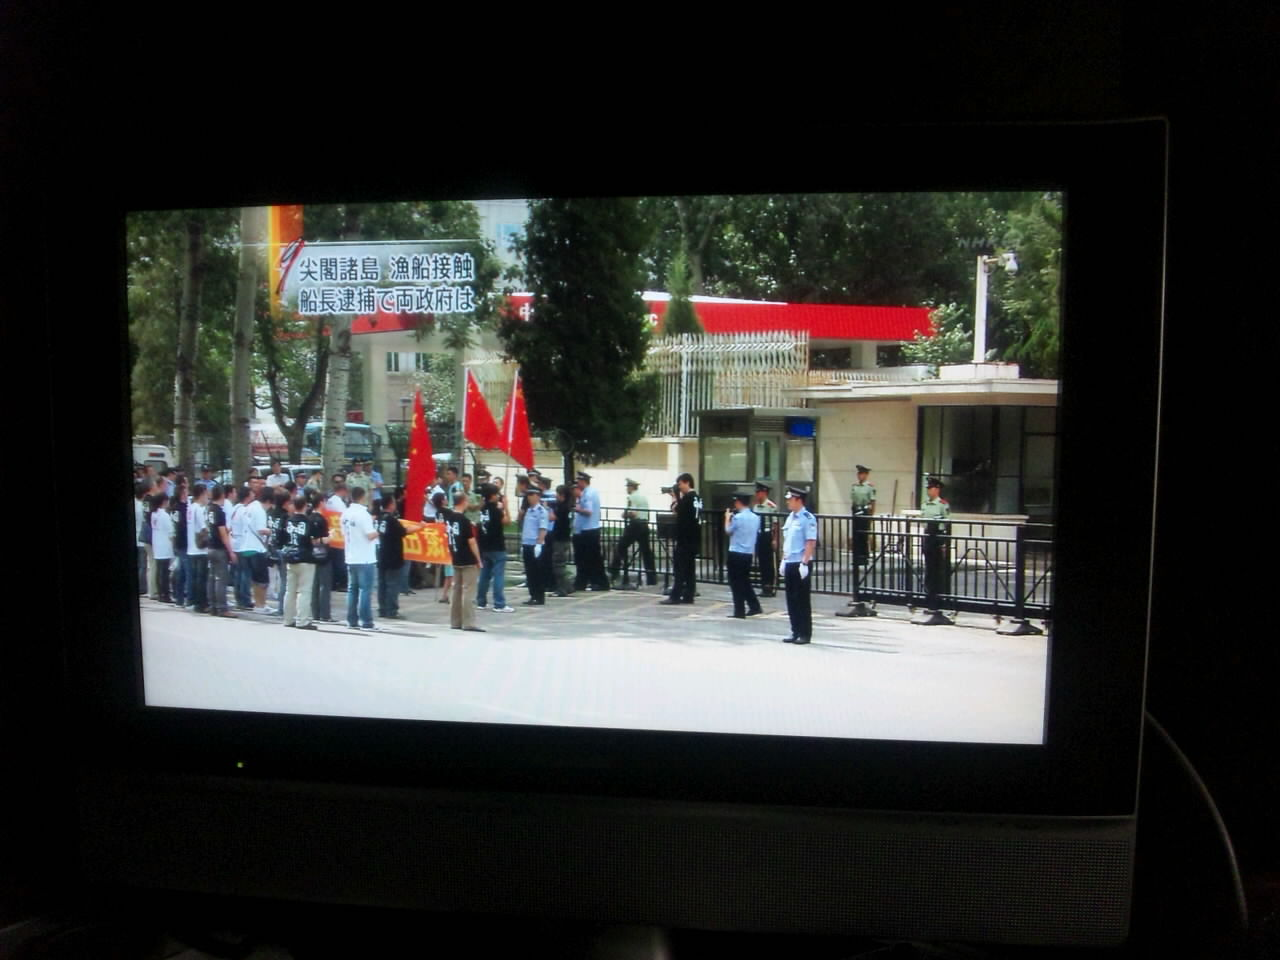 NHKテレビ9時ニュース 再び北京での抗議活動を報道_d0027795_2130578.jpg